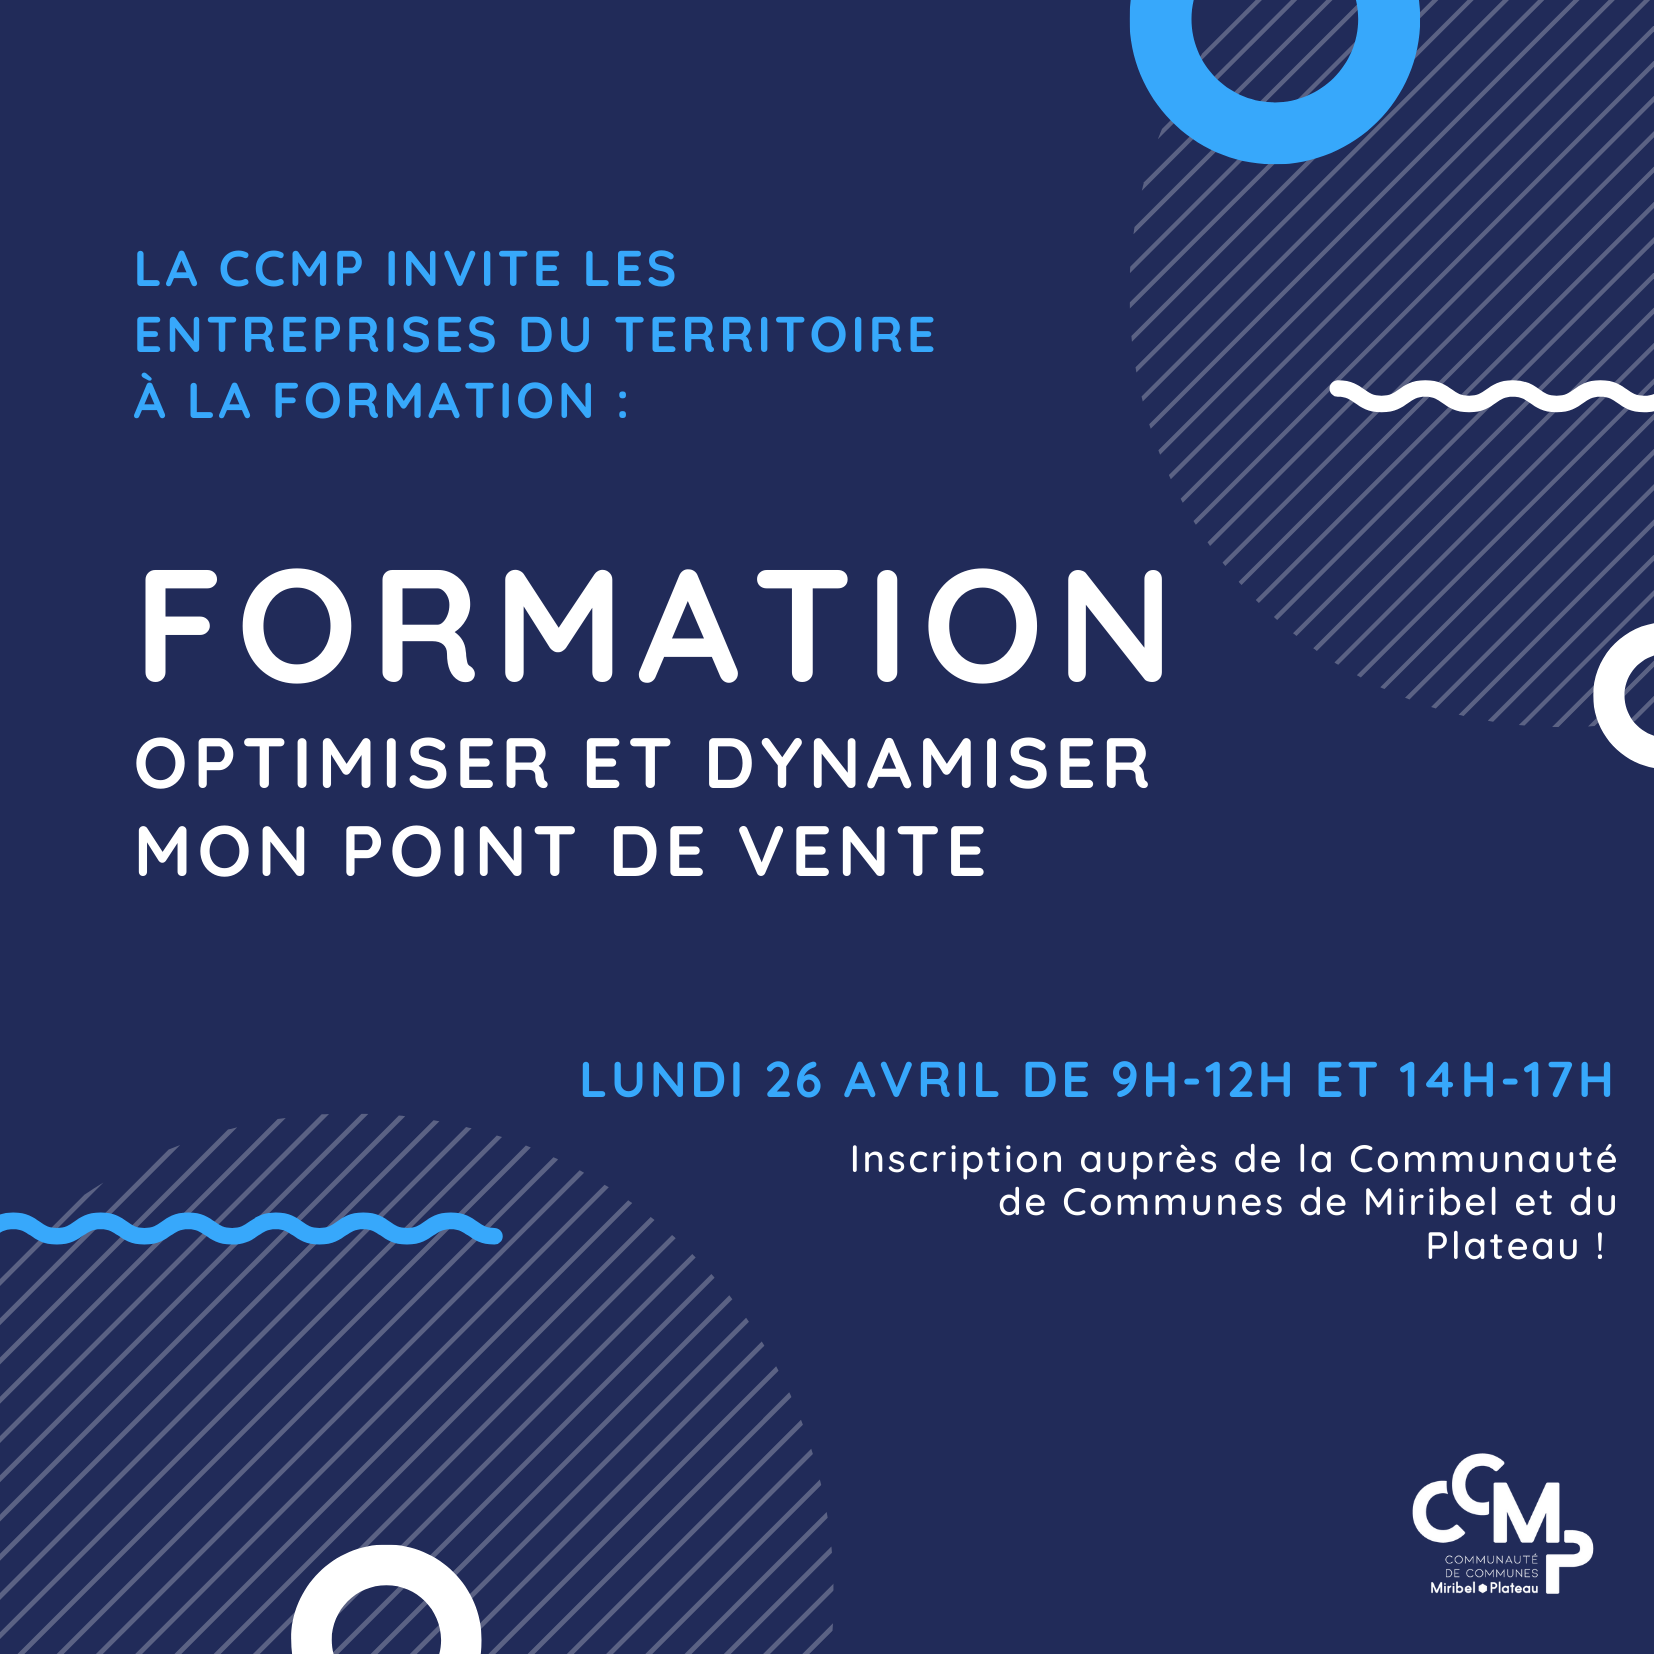 Formation : Optimiser et dynamiser son point de vente